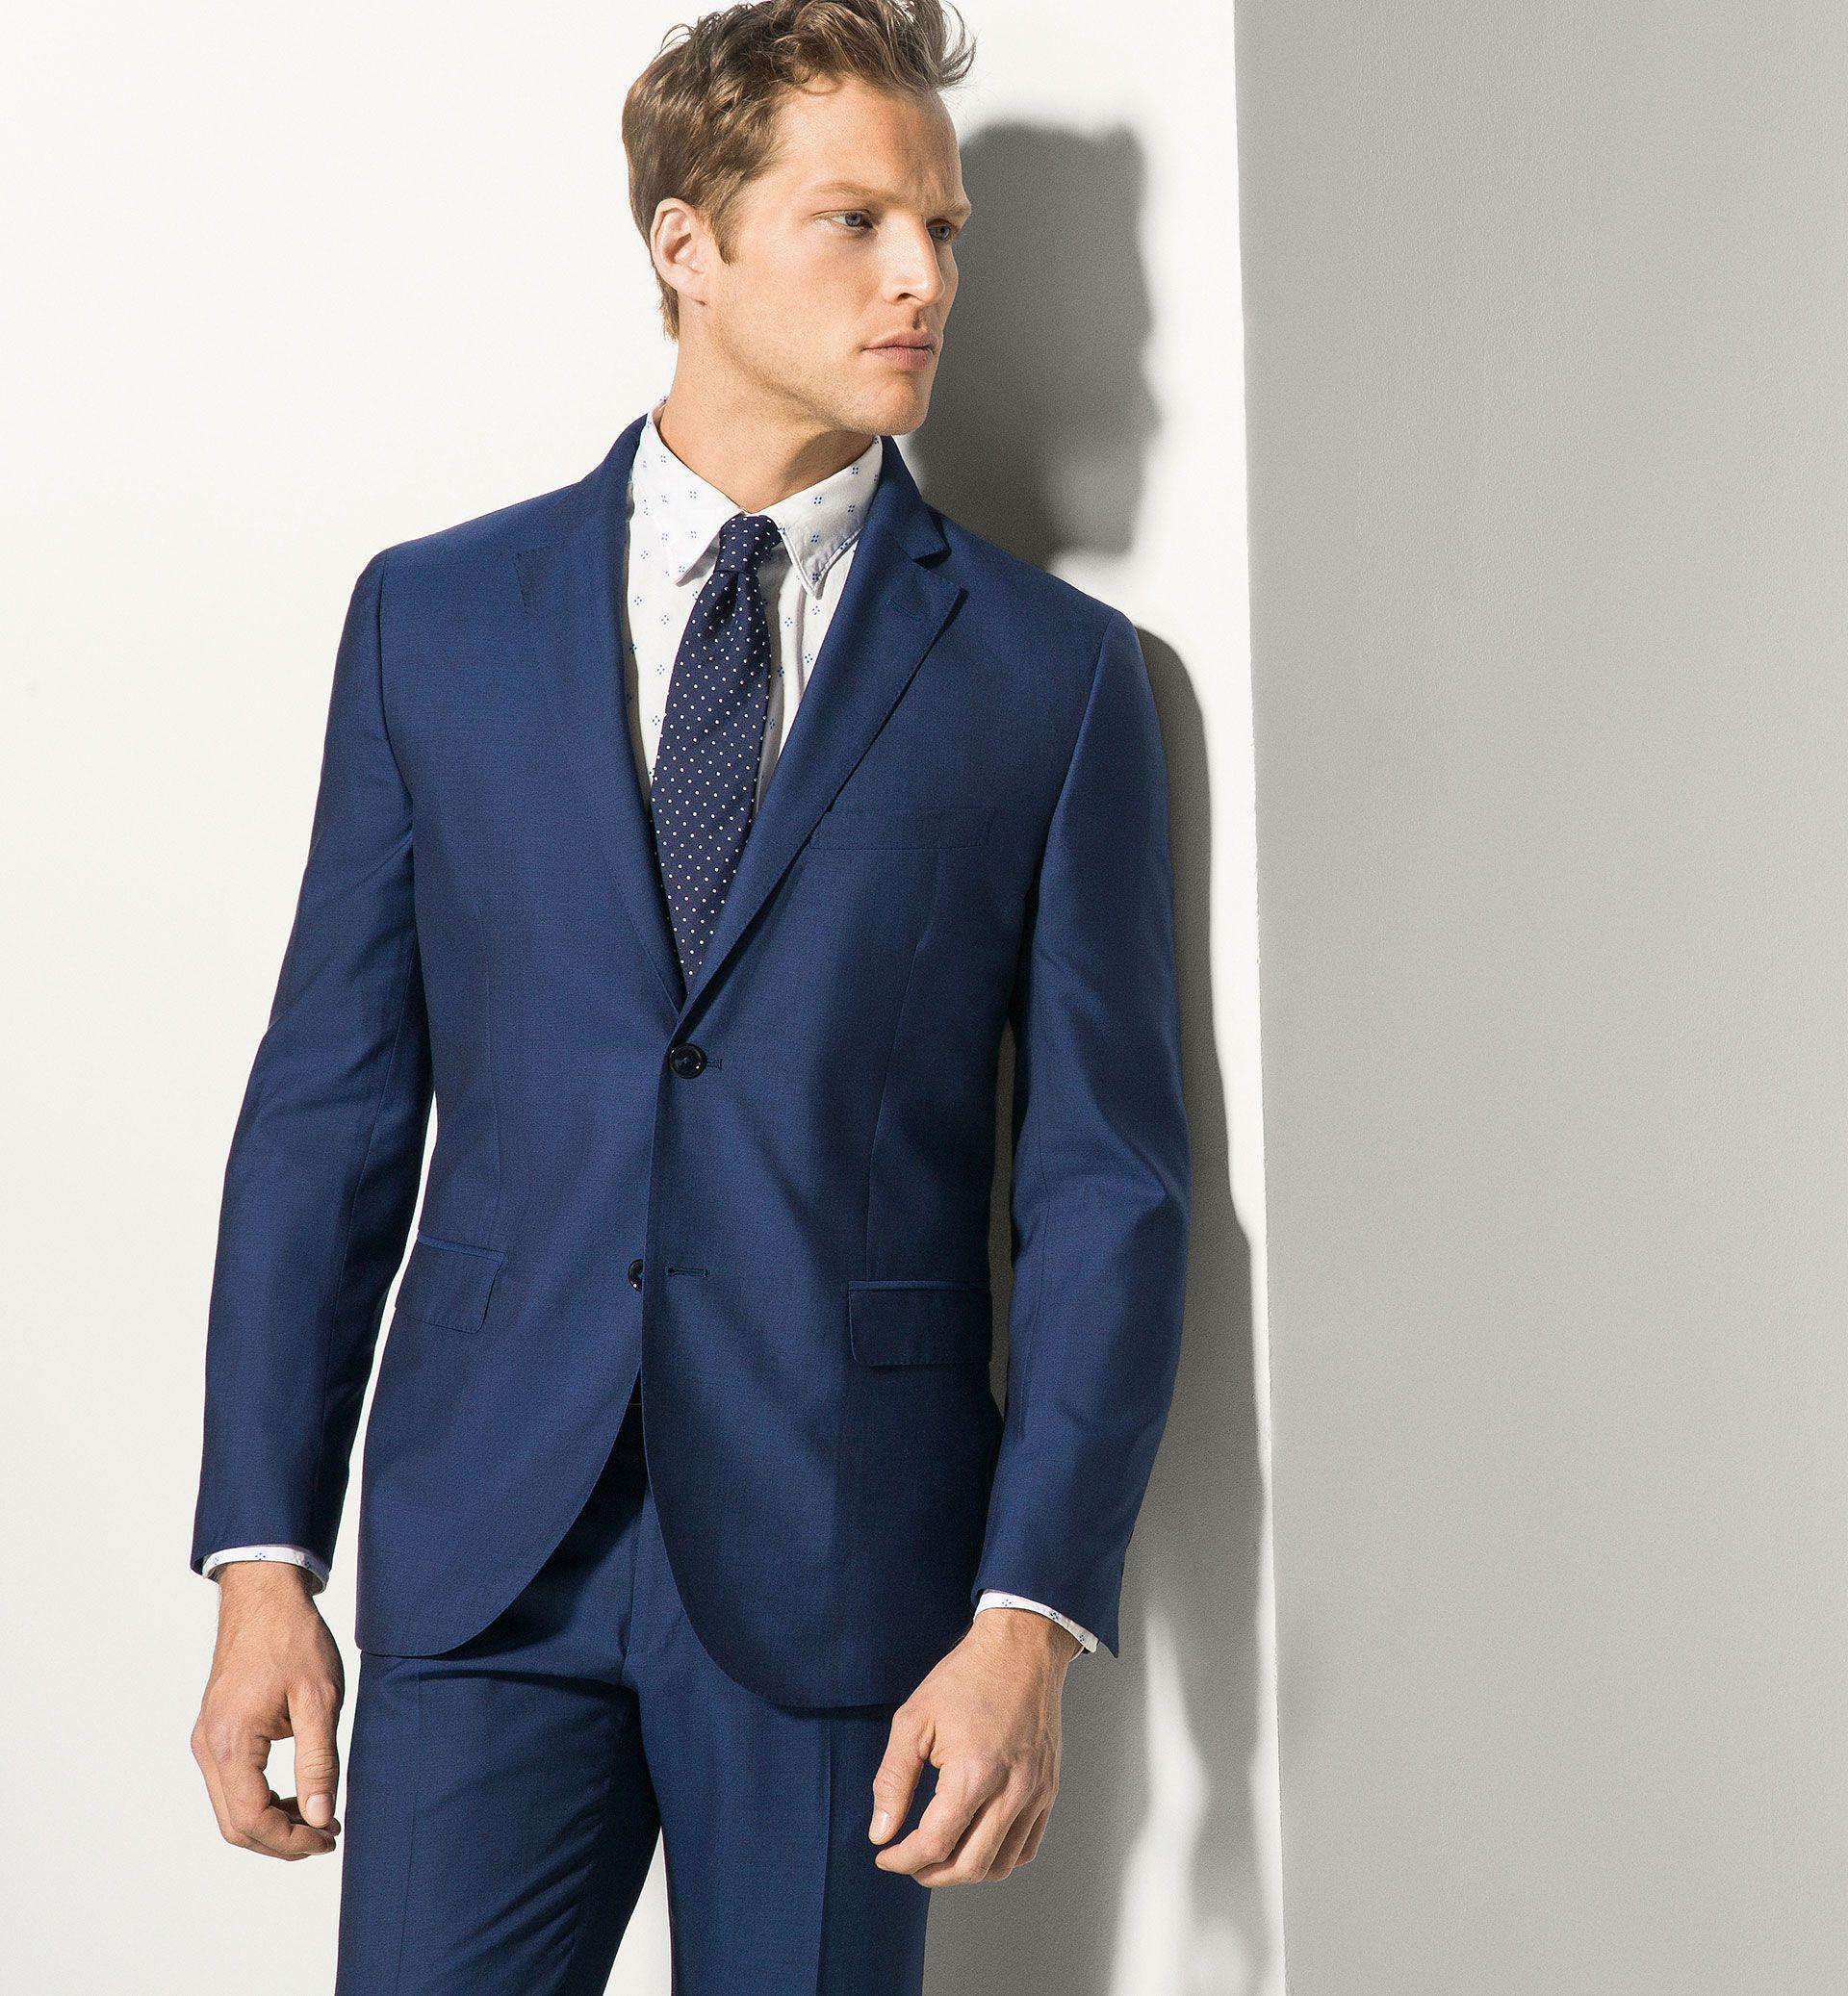 Americana Lana Plana Azul Ver Todo Trajes Men Costa Rica Massimo Dutti Navy Suit Massimo Dutti Latest Trends